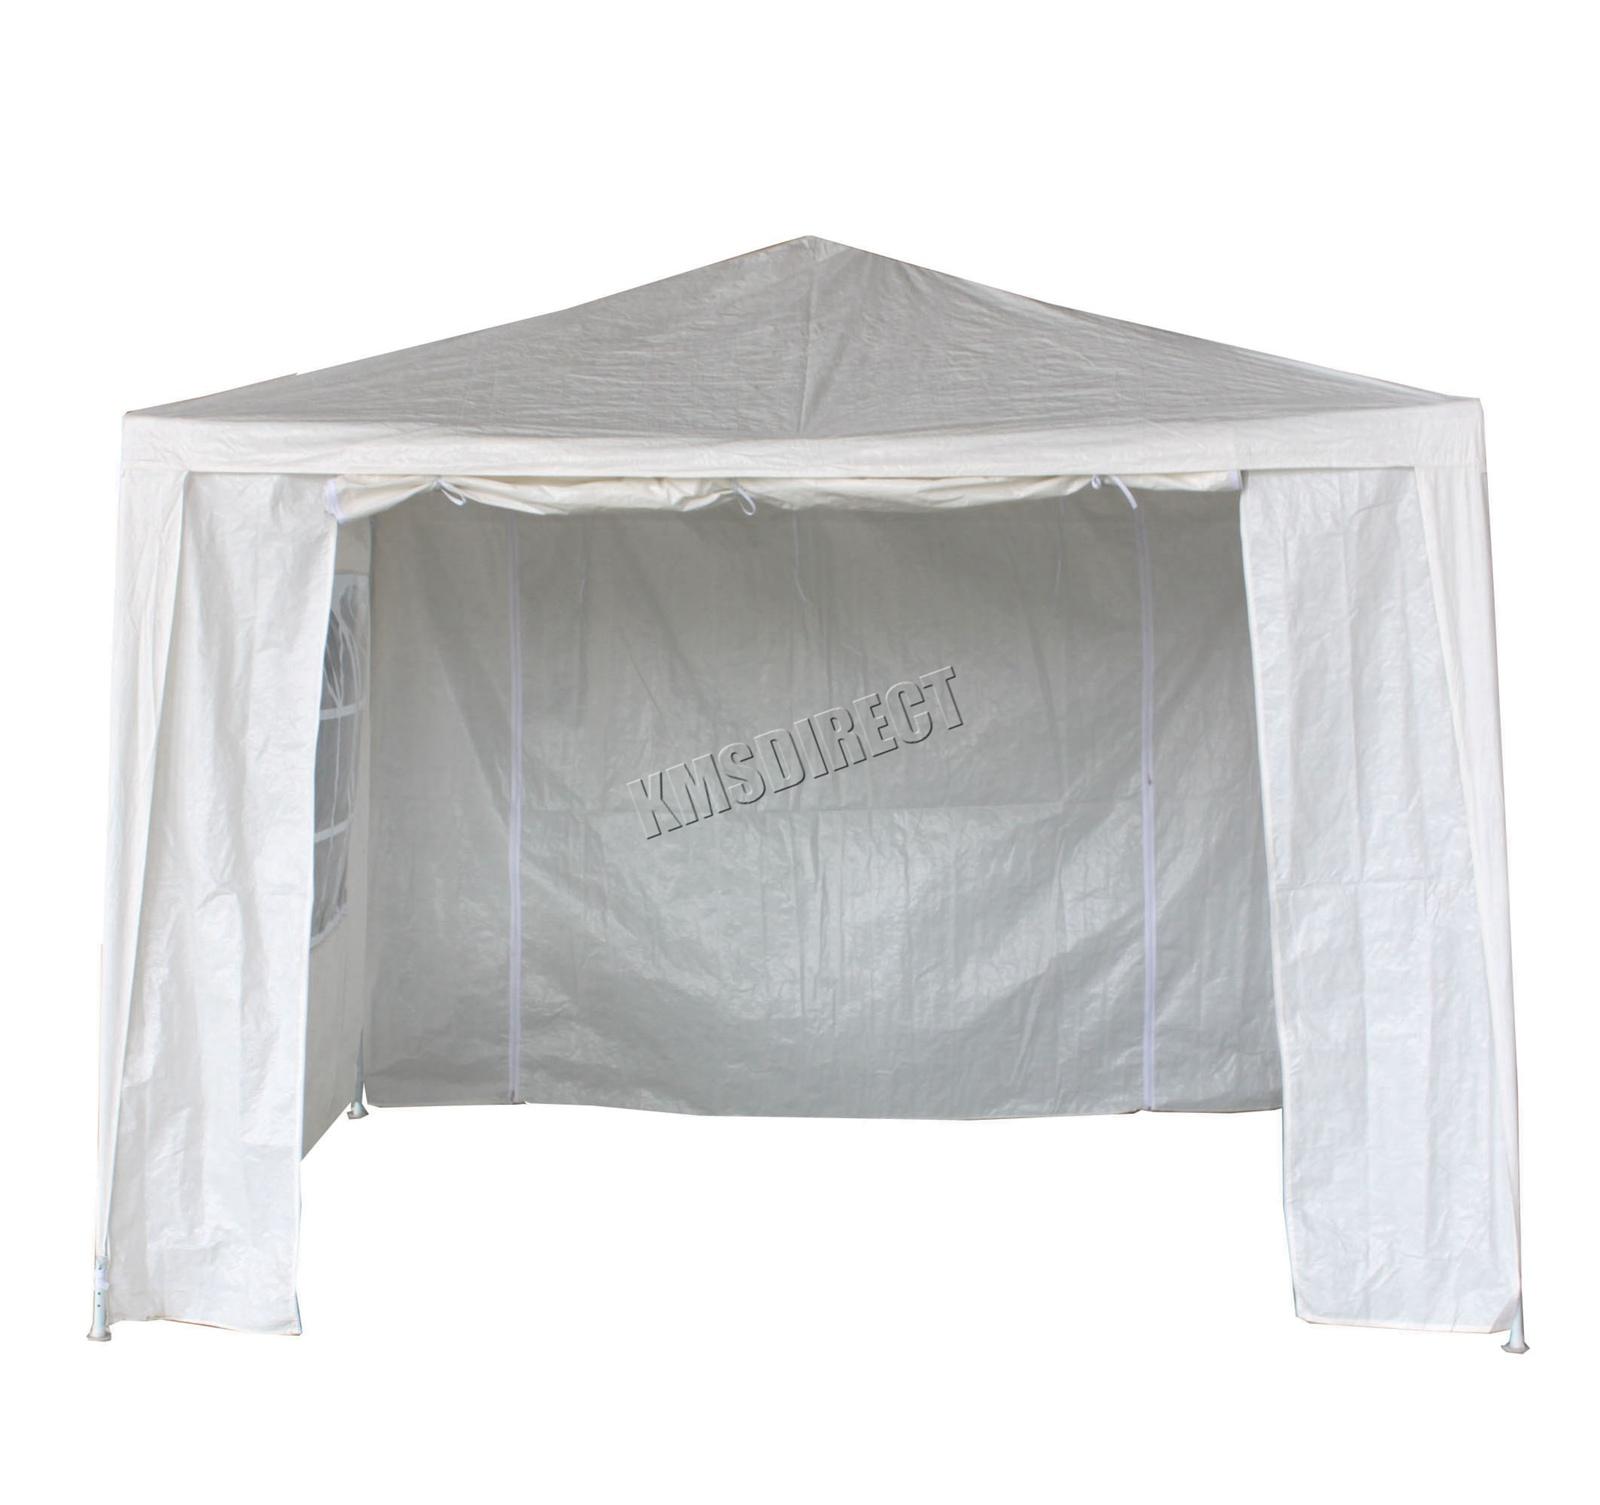 New-3-x-3m-120g-Waterproof-Outdoor-PE-Garden-Gazebo-Marquee-Canopy-Party-Tent Indexbild 26